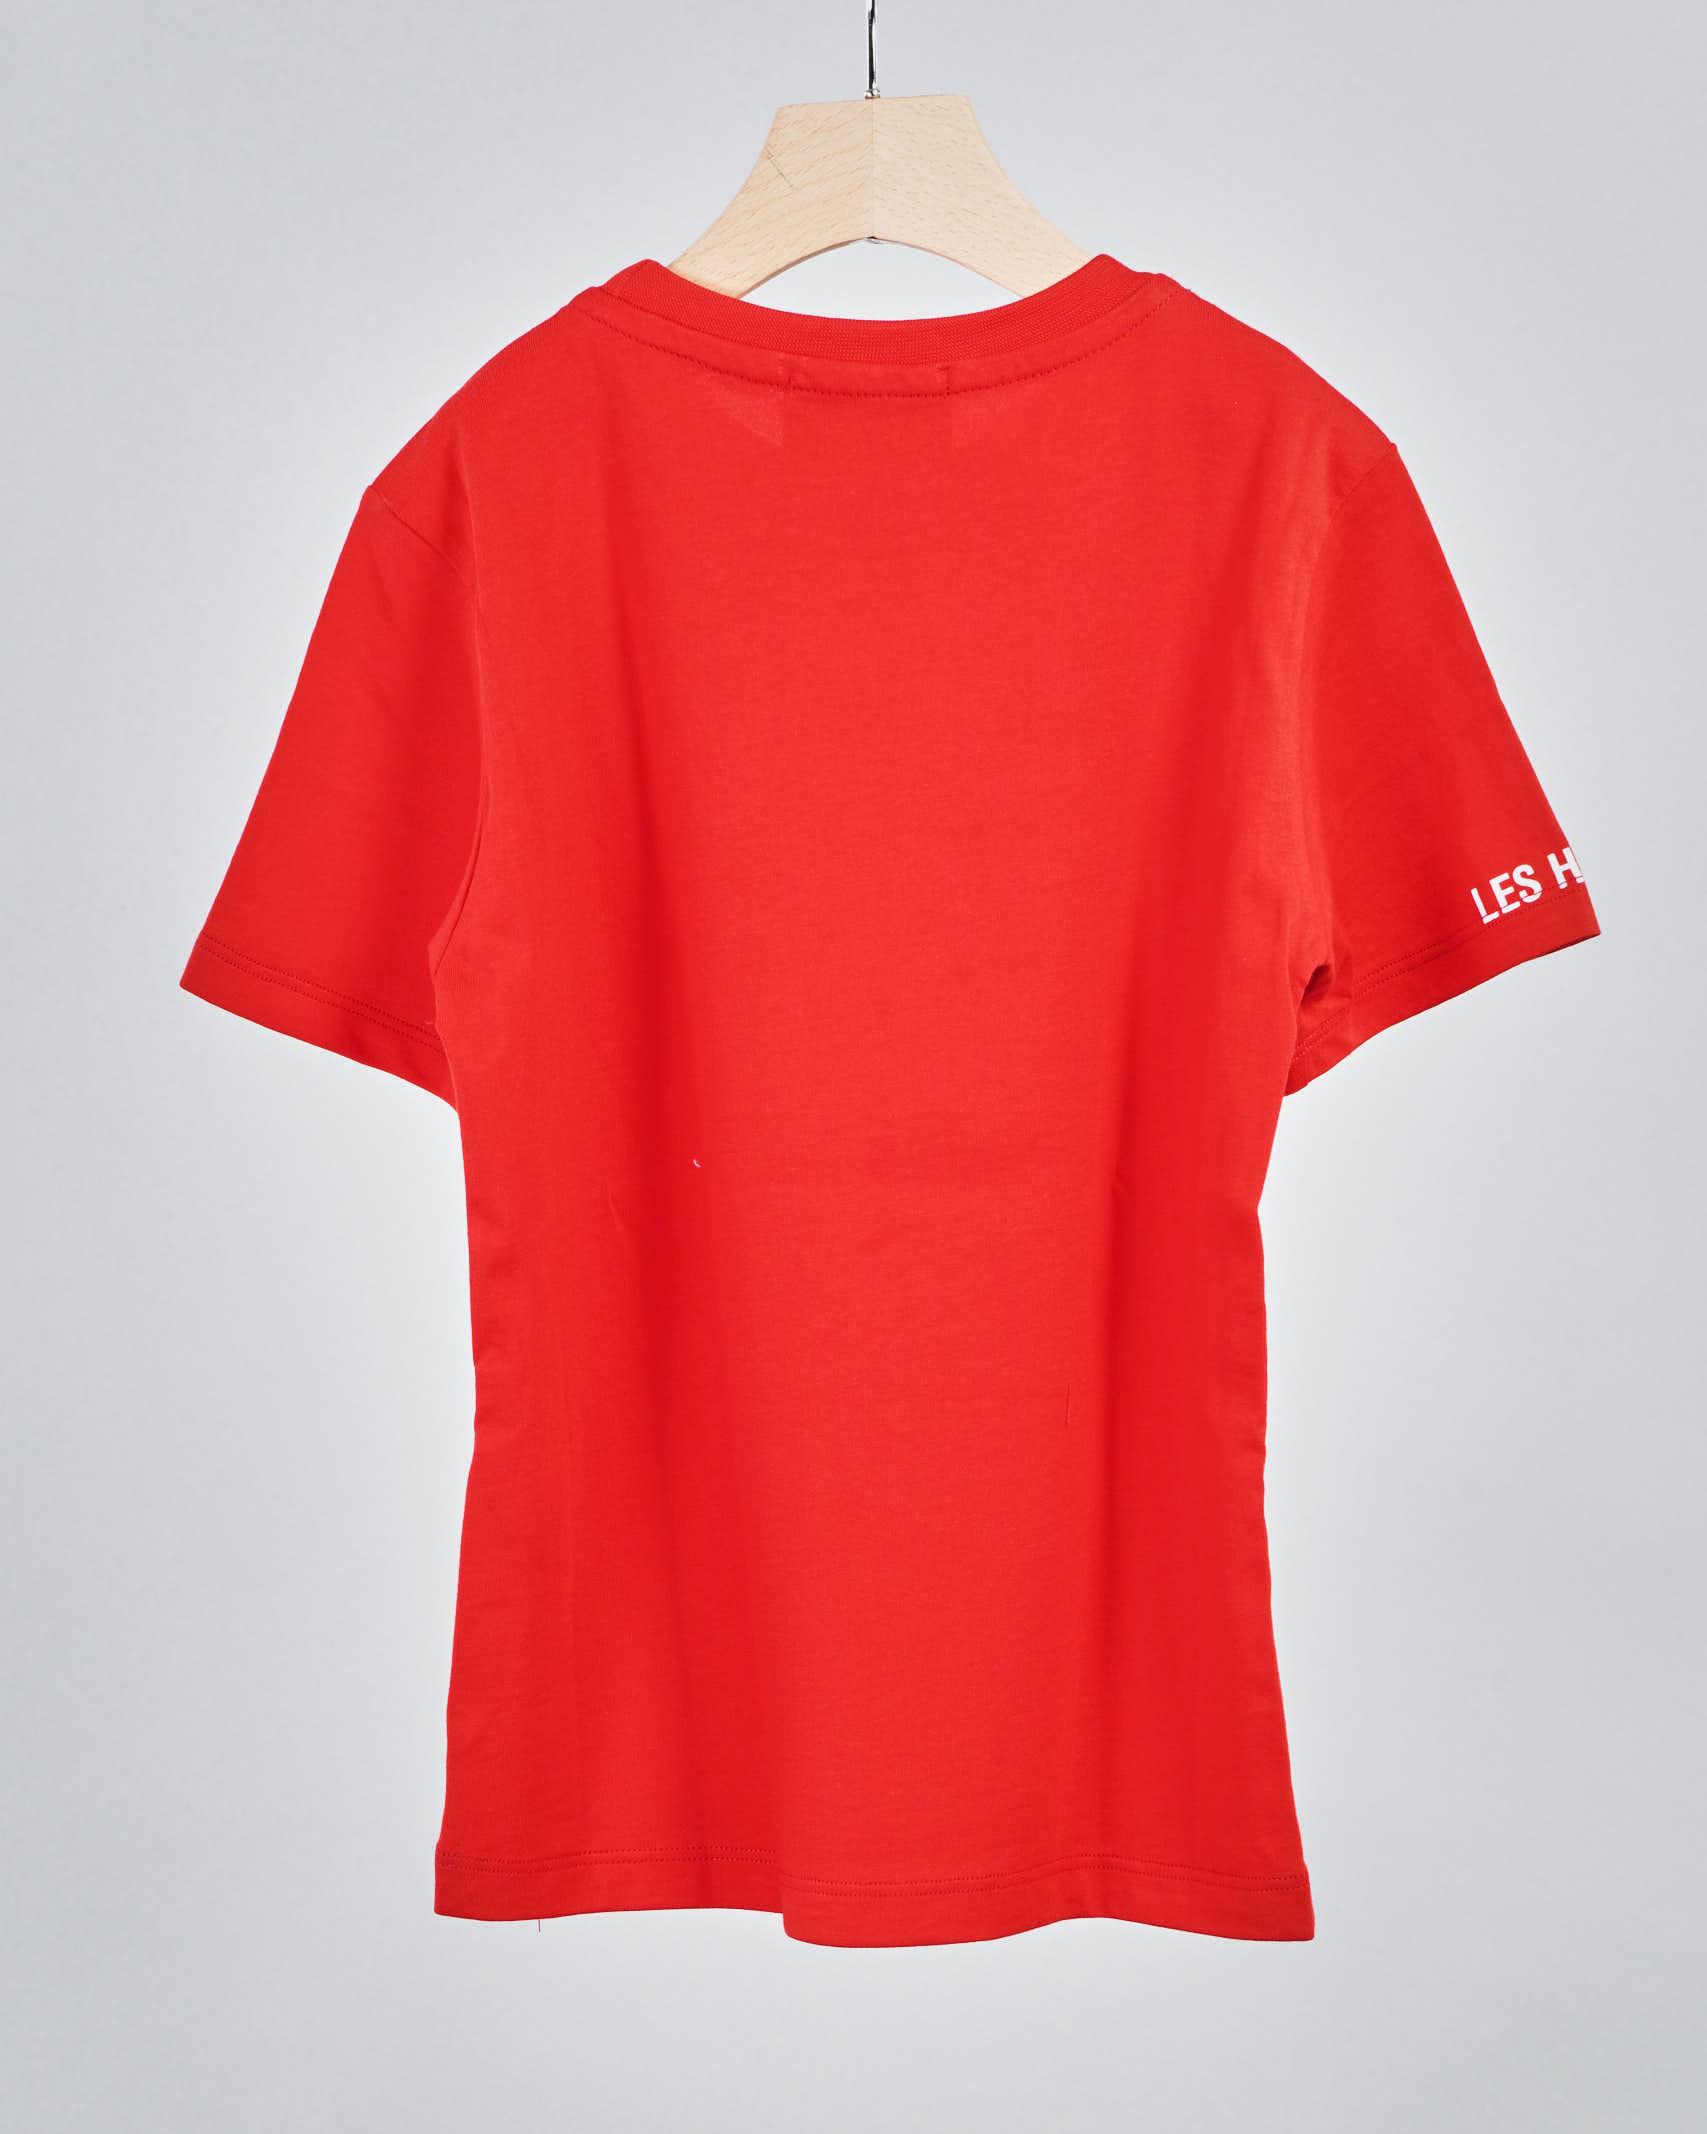 T-shirt con stampa Les Hommes Kids LES HOMMES KIDS   T-shirt   TSLH2102300